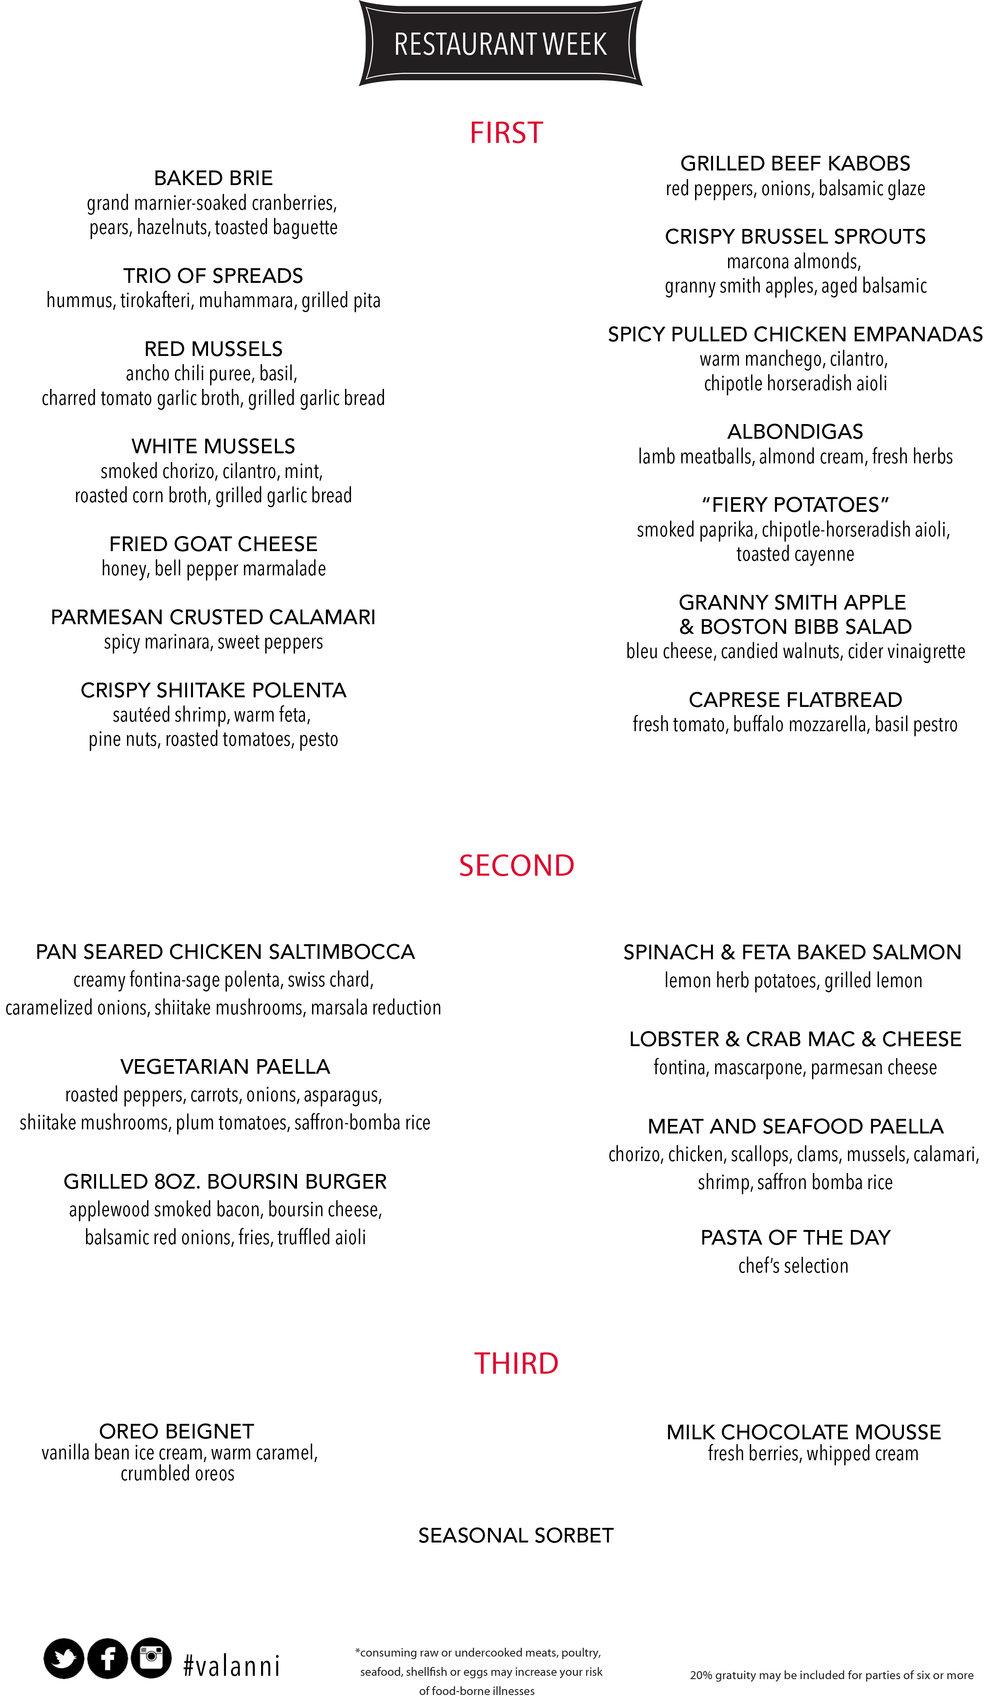 Valanni_RW_Sept_2017_menu_2.jpg